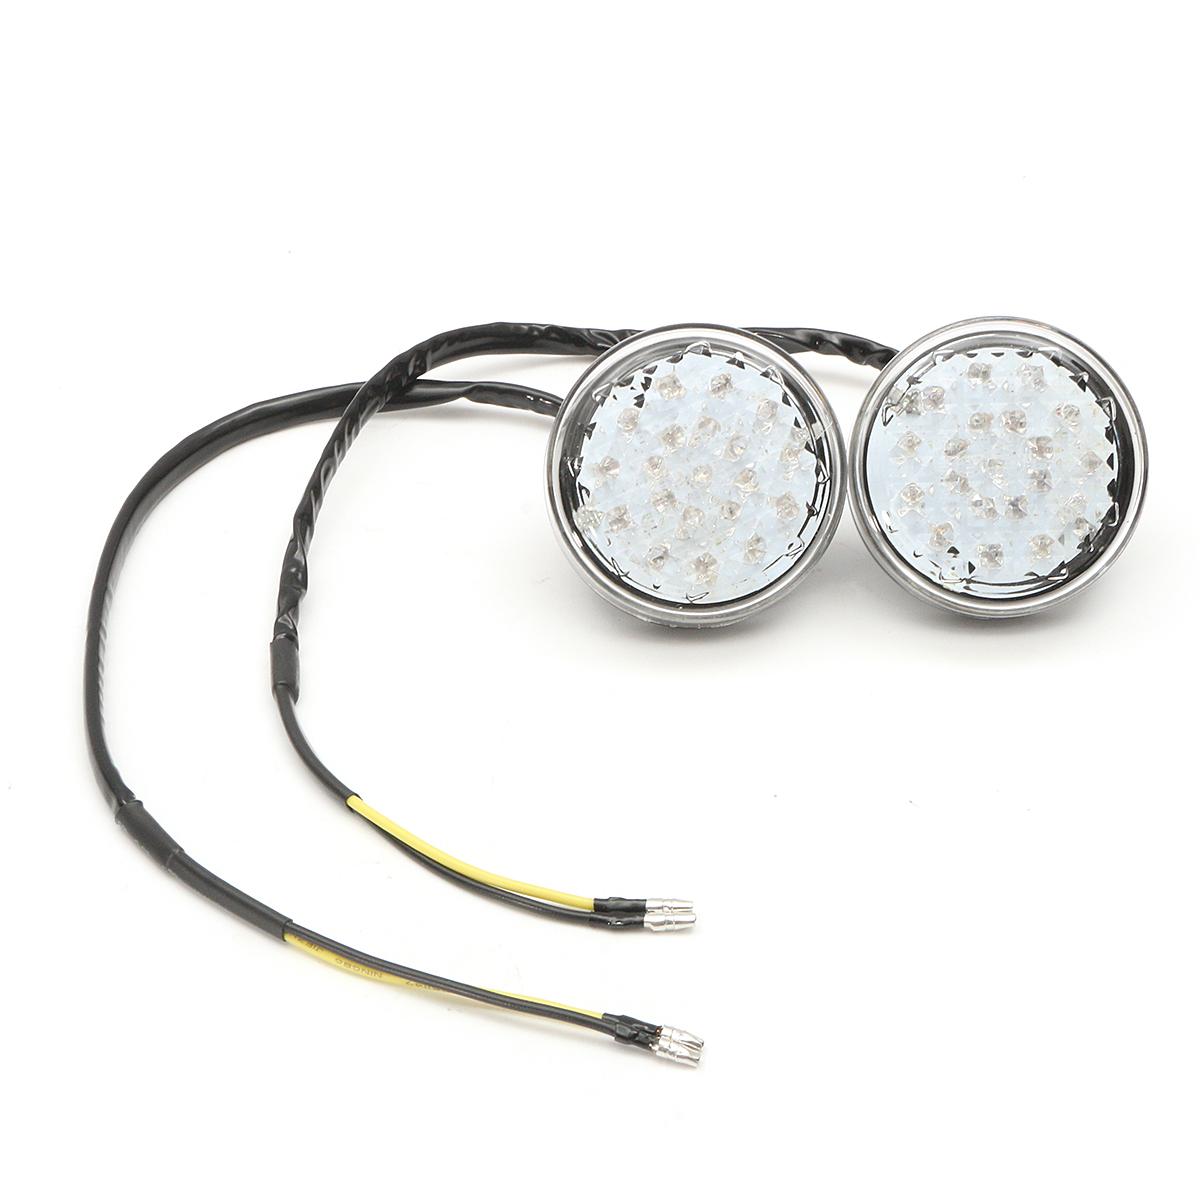 Pair 12V Universal Motorcycle Bike Round LED Turn Signal Indicator Blinker Light Lamp